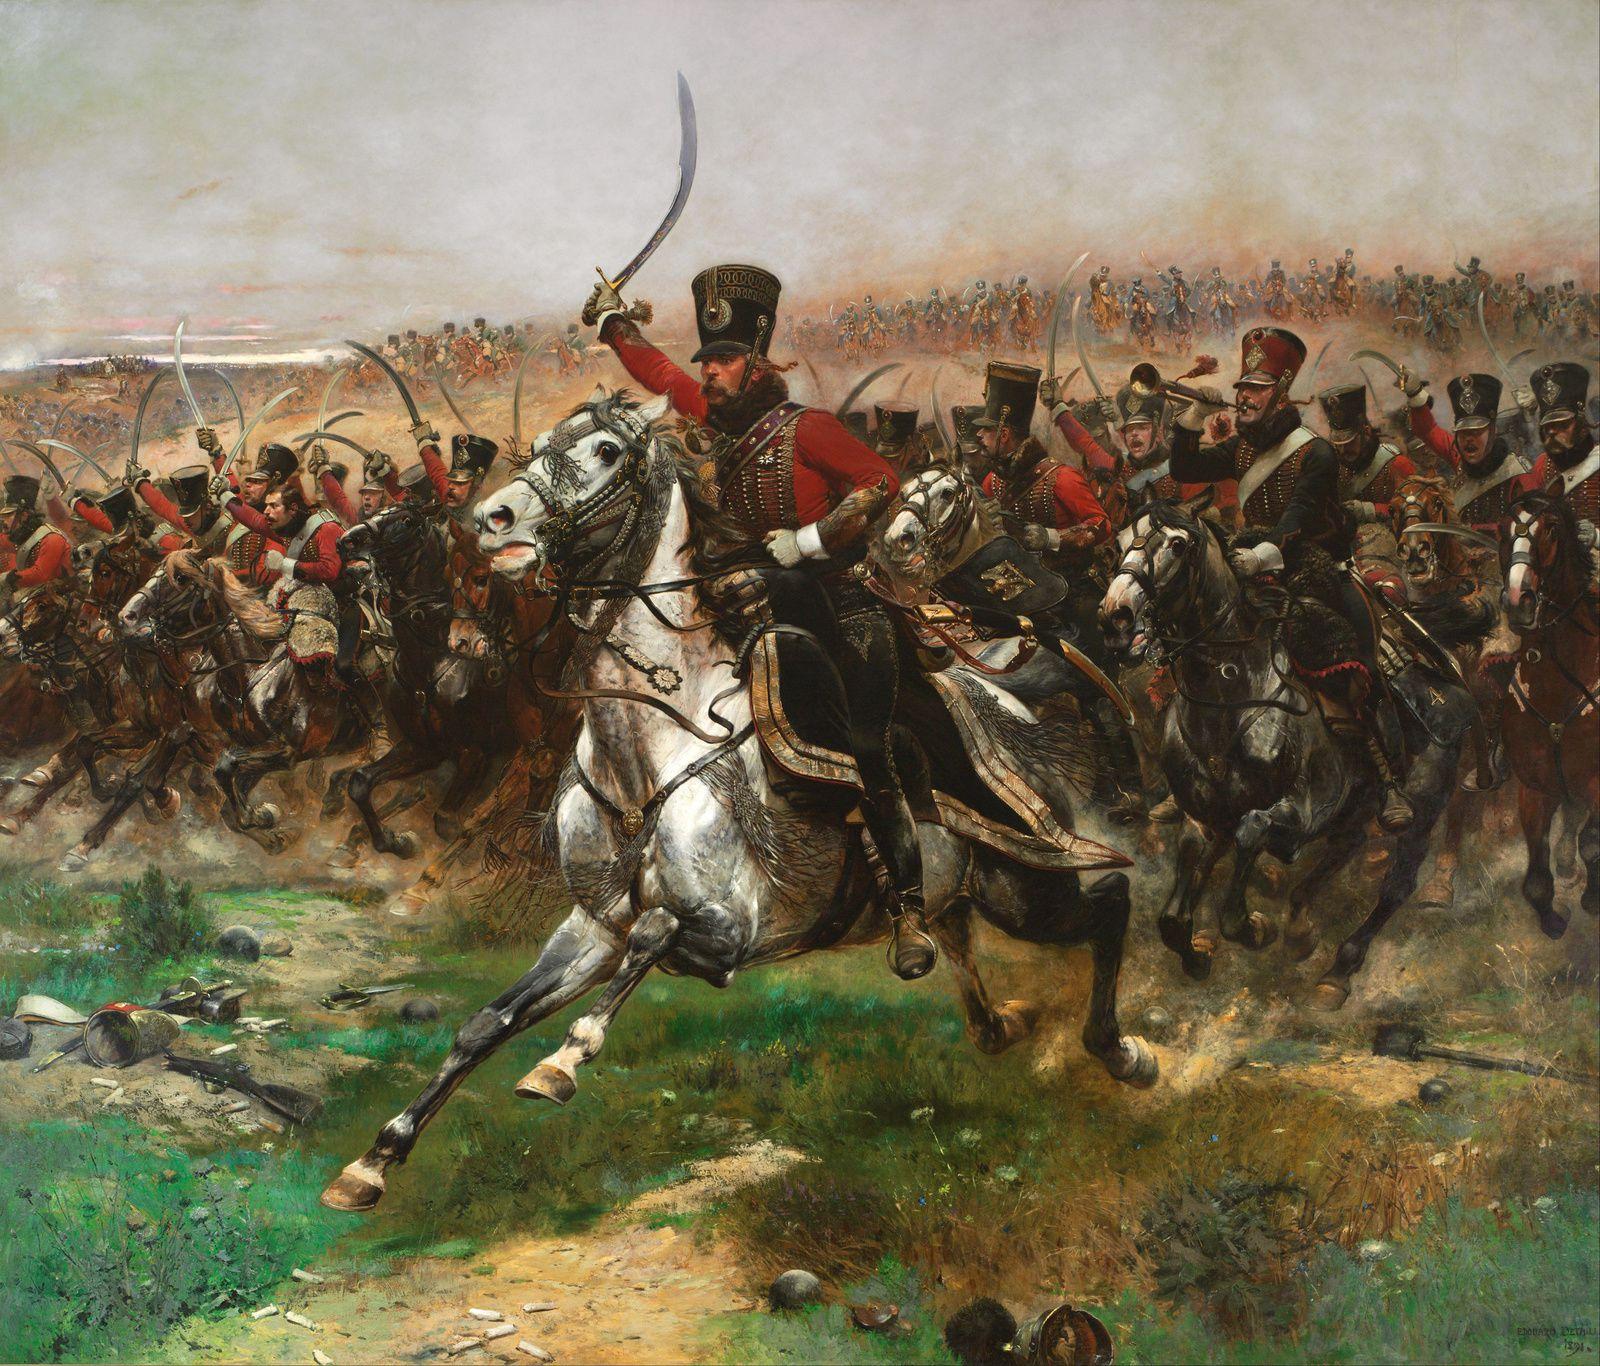 ( I ) Tableau d'Edouard Detaille: la bataille de Waterloo.( II ) Buste de Beethoven, par Bourdelle. ( III ) Esquisse de Victor Hugo.